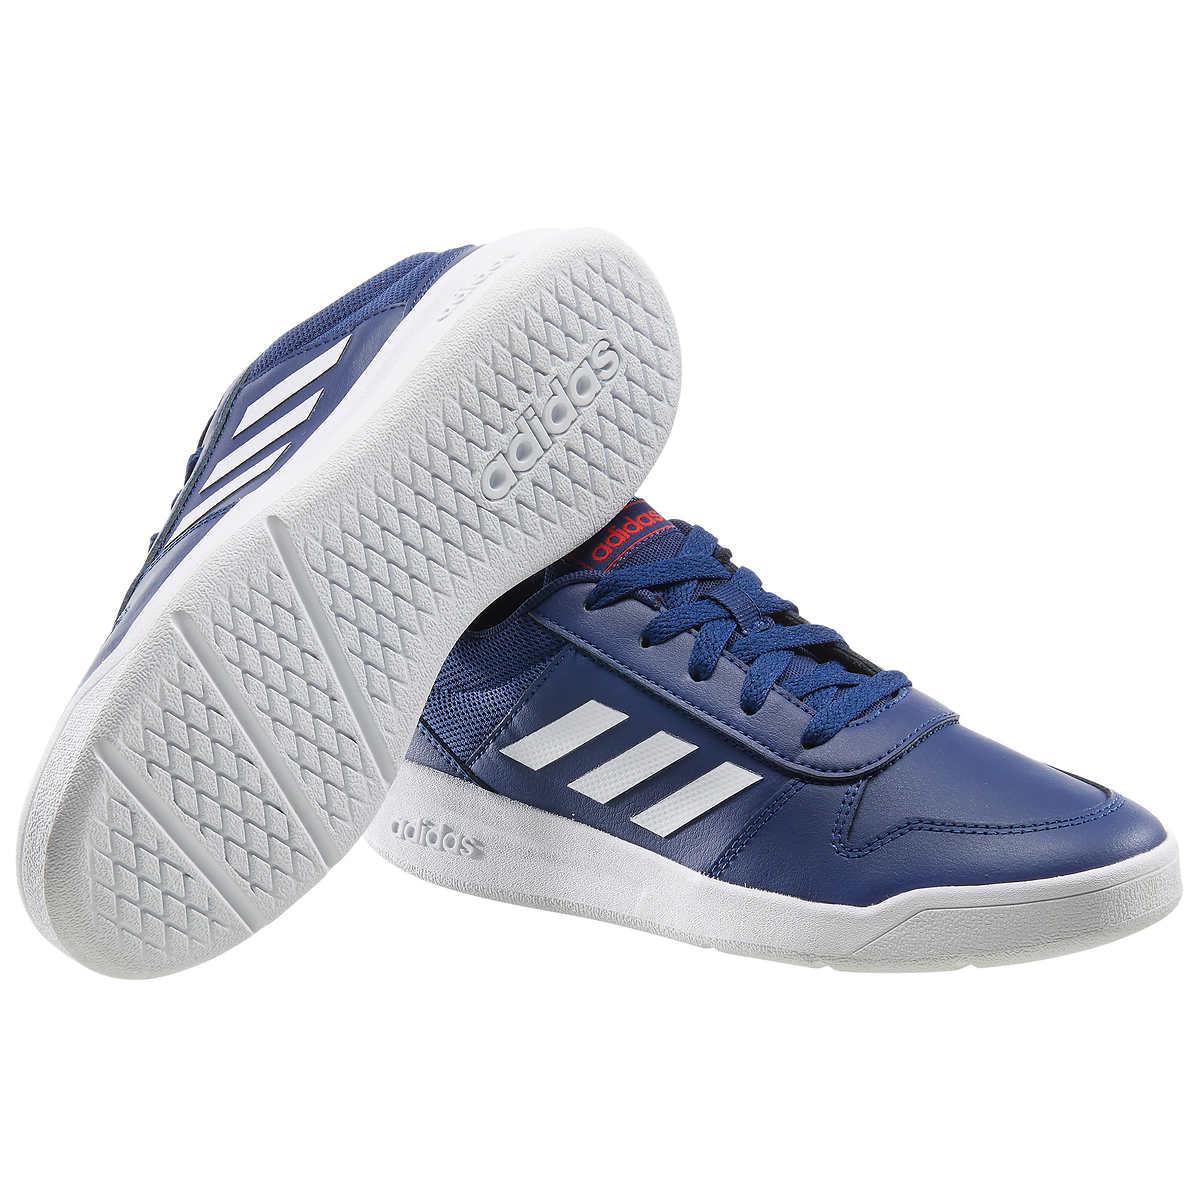 Details about Adidas Boys Tensaur Navy Tennis Shoes